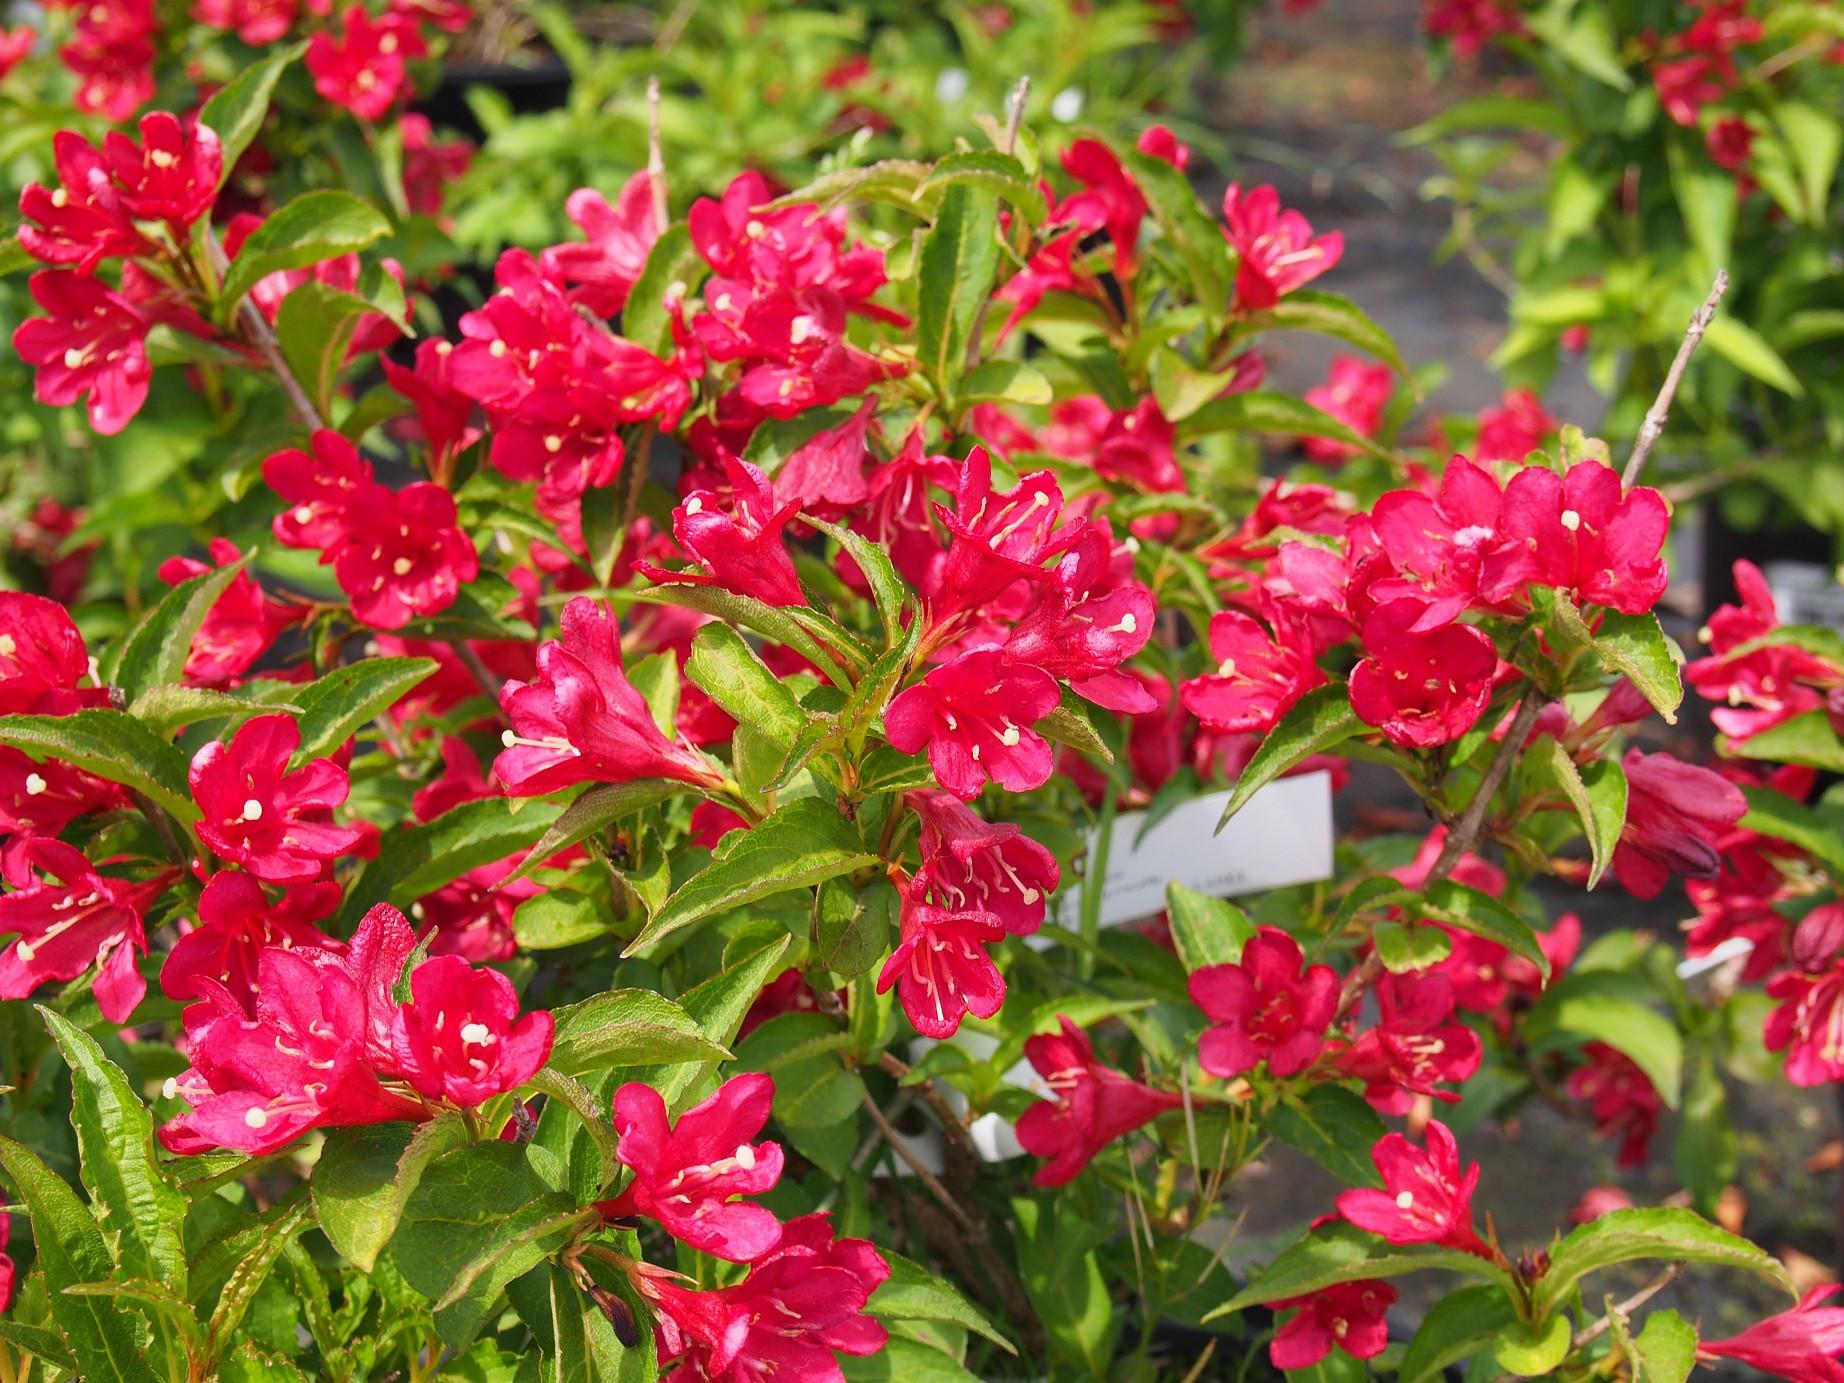 Arbuste Nain Persistant Plein Soleil weigela nain rouge ® (courtanin) - weigelia